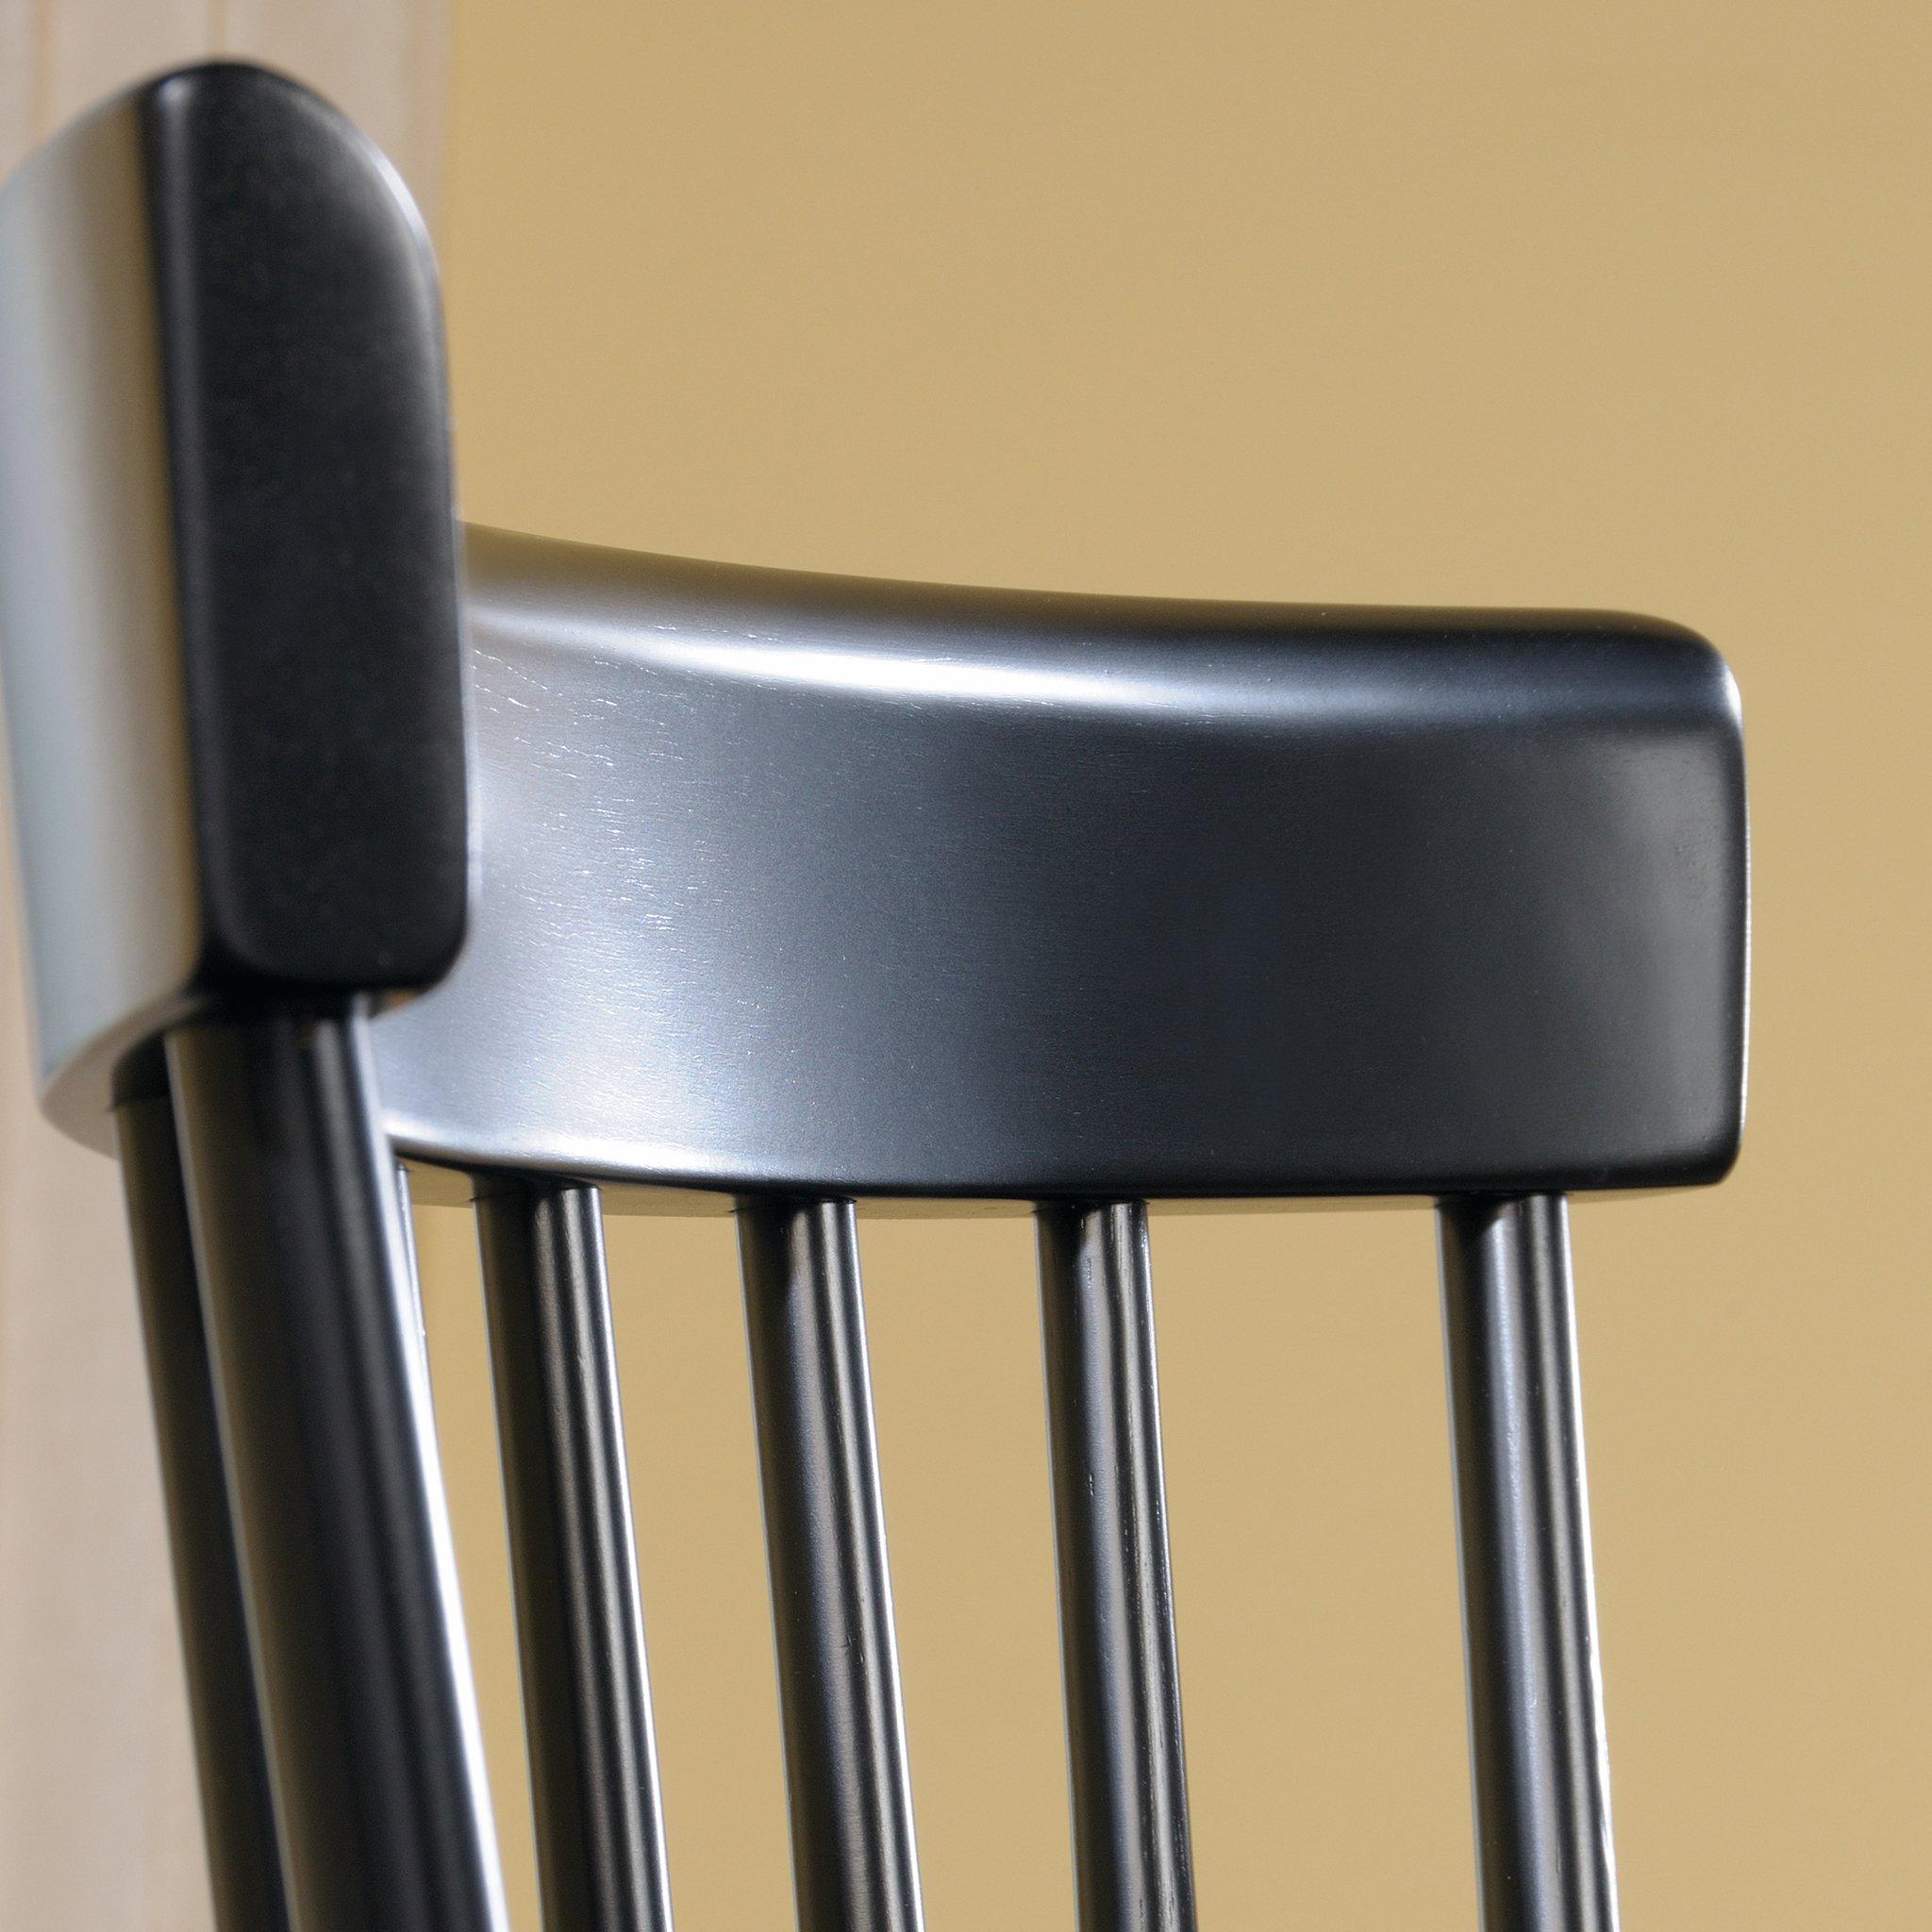 Sauder 418892 New Grange Spindle Back Chairs, L: 20.47'' x W: 21.26'' x H: 36.22'', Black finish by Sauder (Image #4)